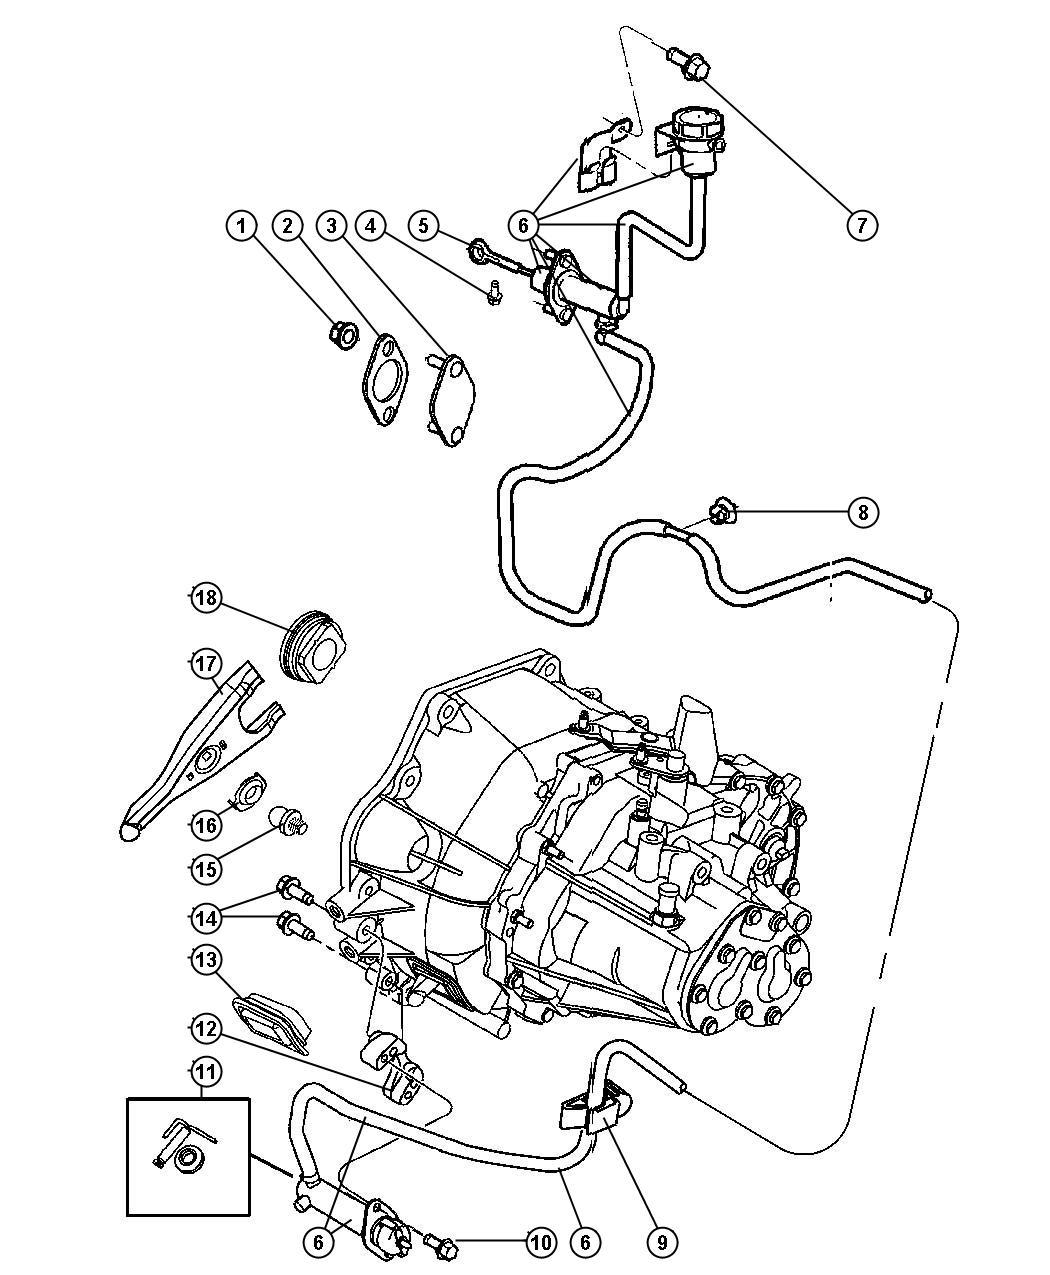 Jeep Patriot Actuator. Hydraulic clutch. Transmission